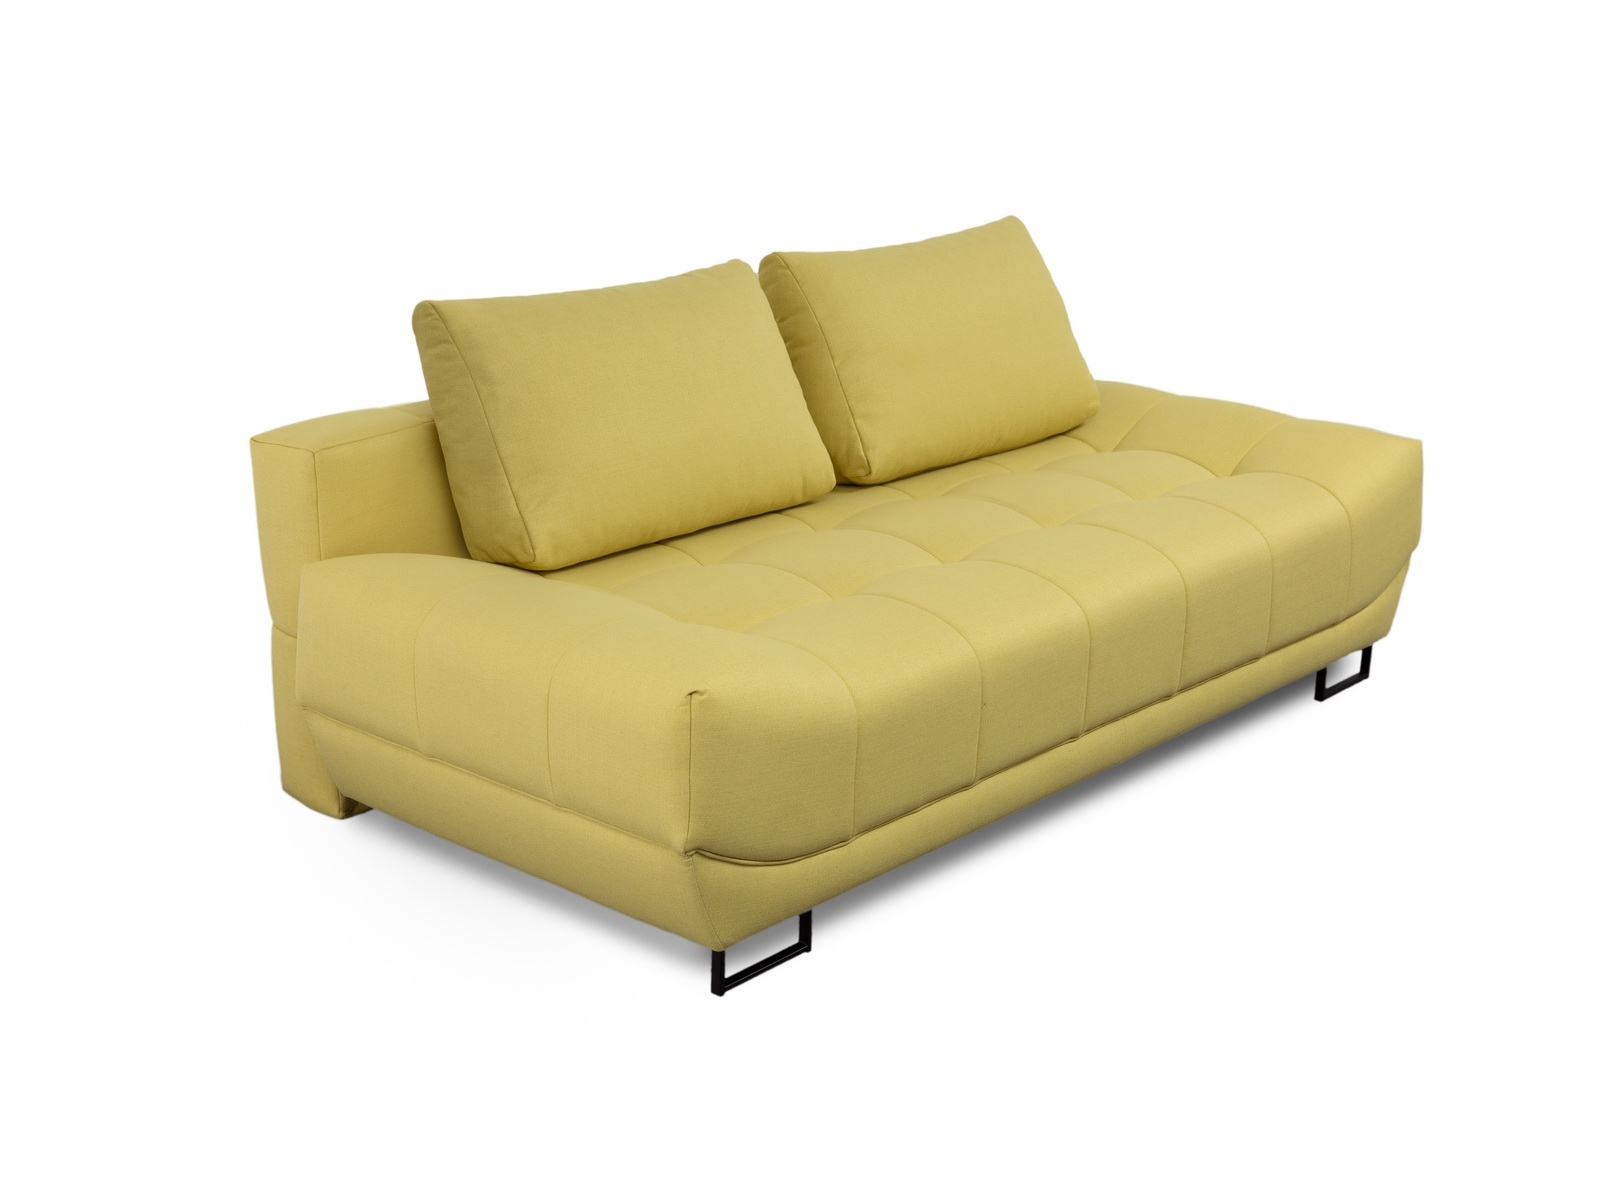 Canapea extensibila cu lada de depozitare, 3 locuri Venice Galben, l218xA112xH71 cm